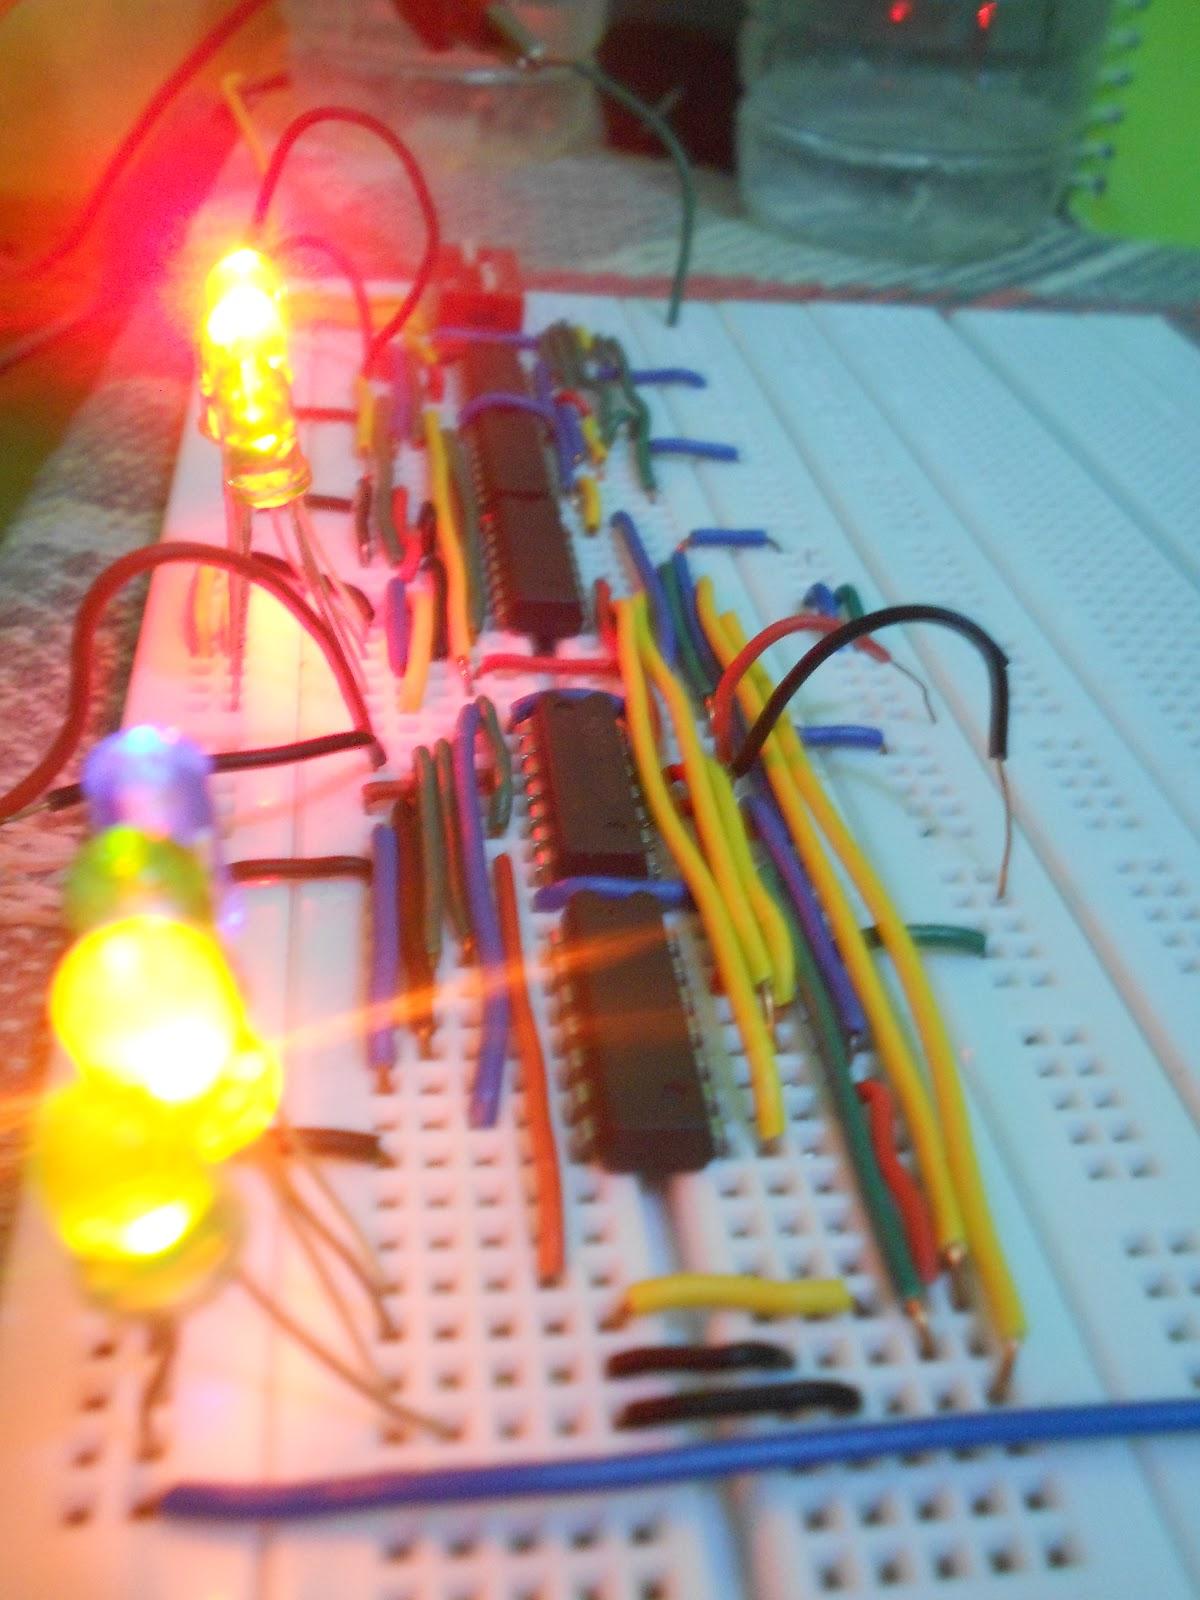 Pin Bit Full Adder Circuit Diagram On Pinterest